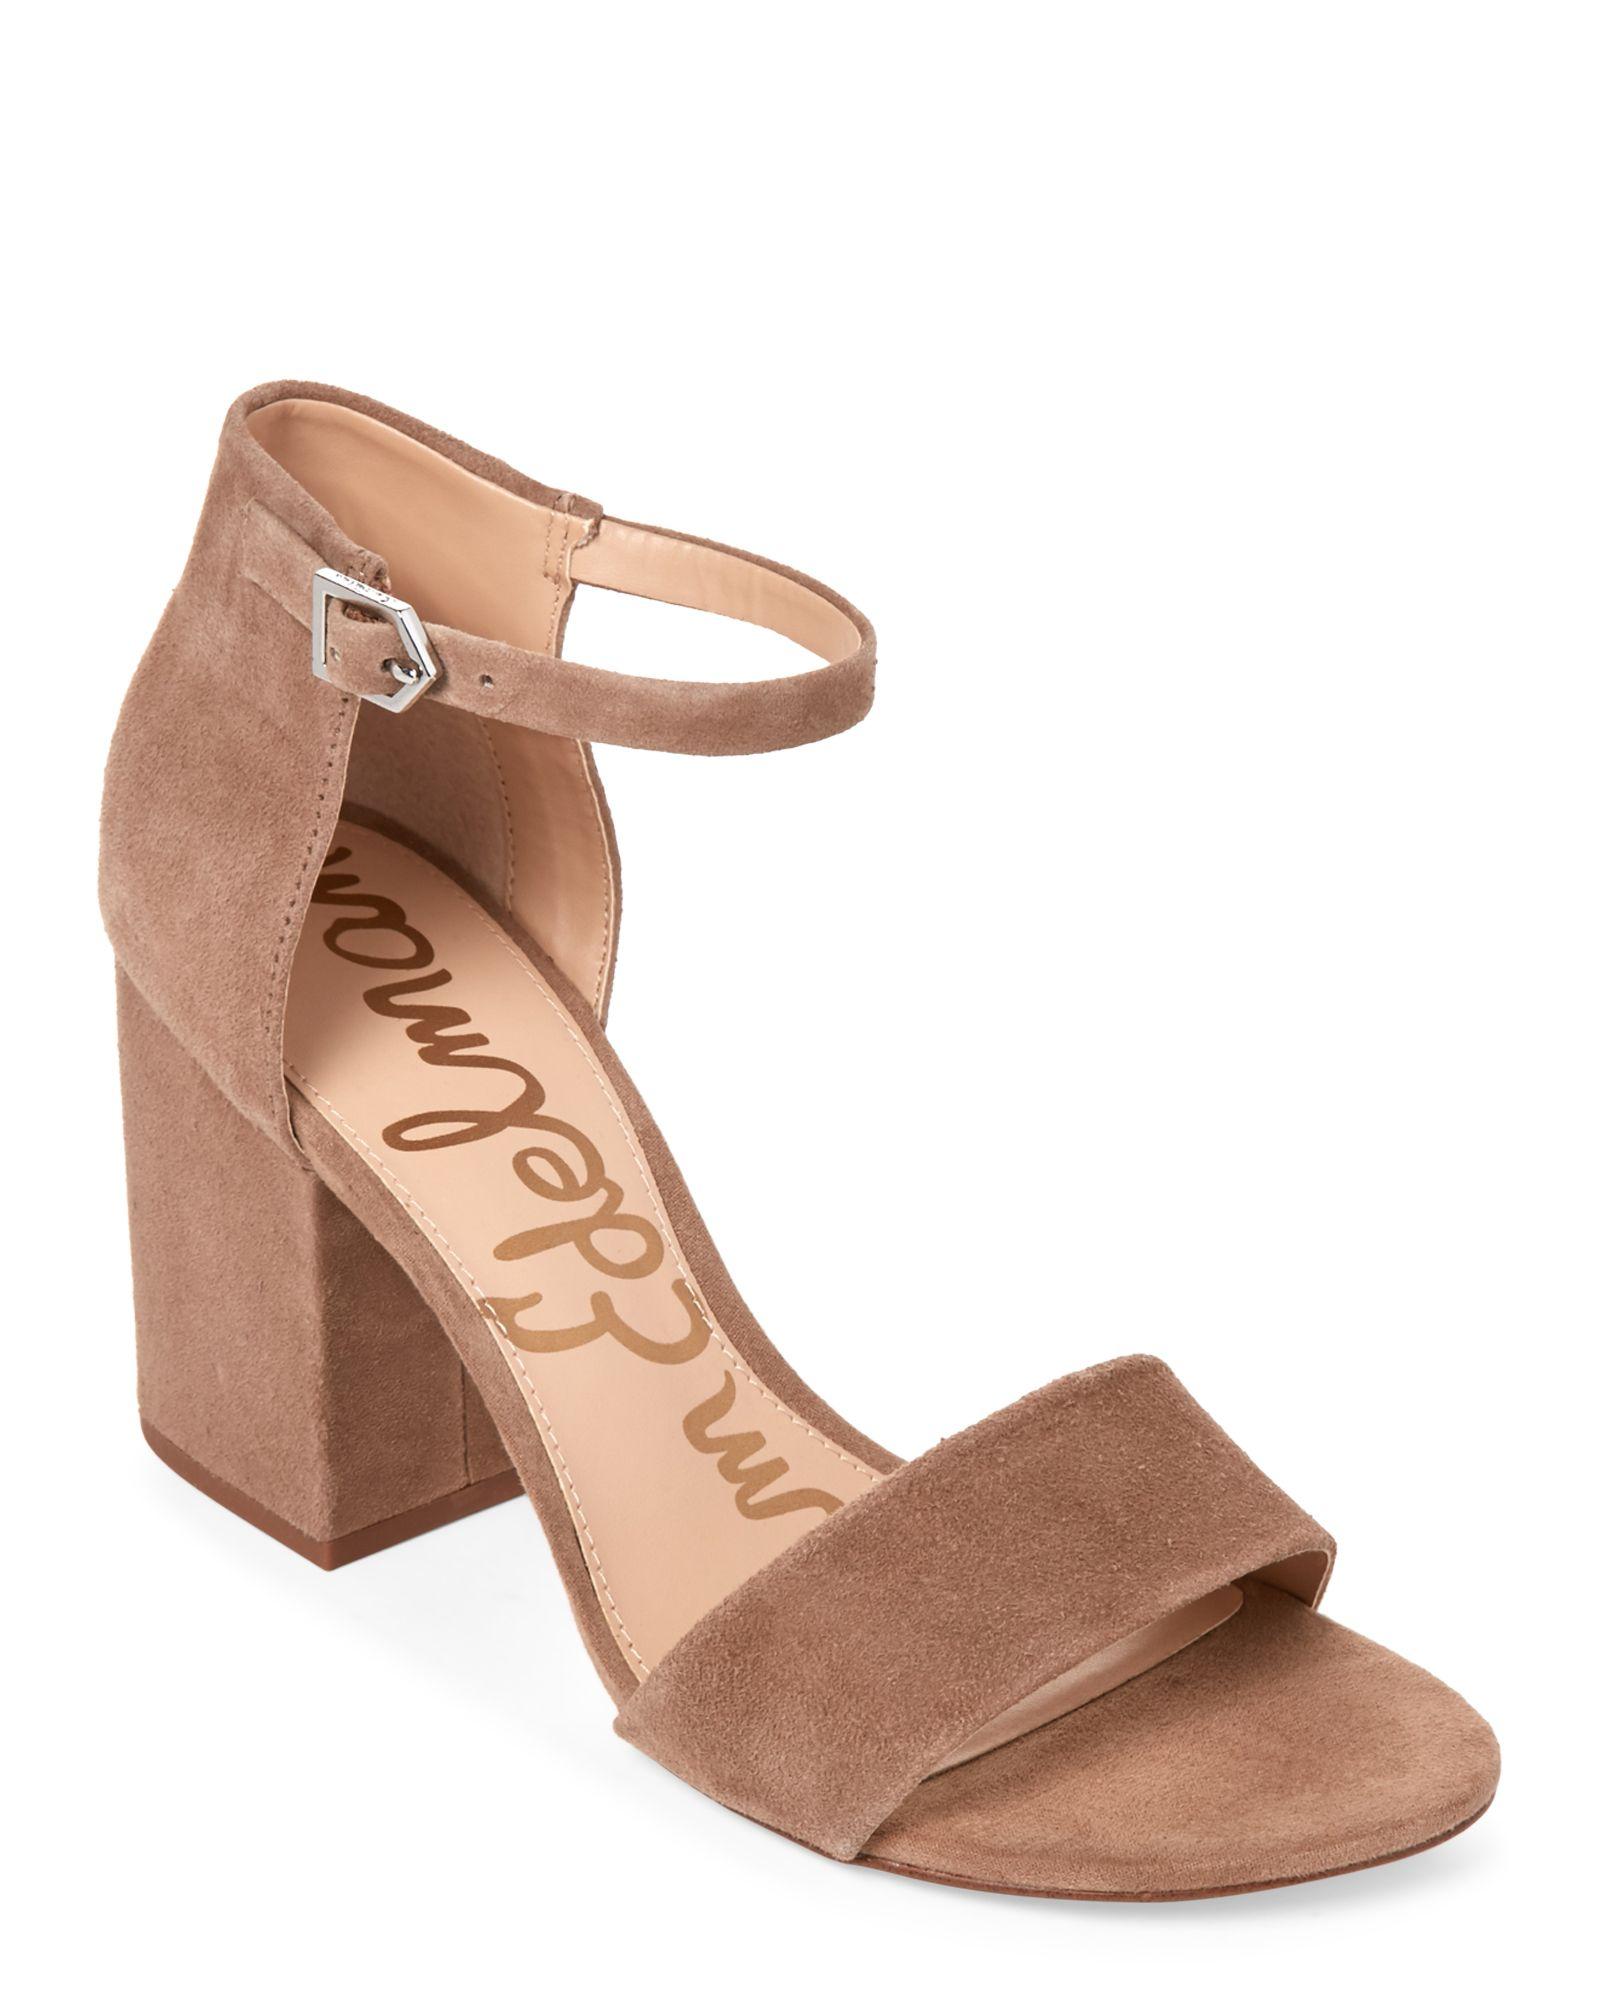 cbca984c56f9 Sam Edelman Oatmeal Torrence Two-Piece Block Heel Sandals ...